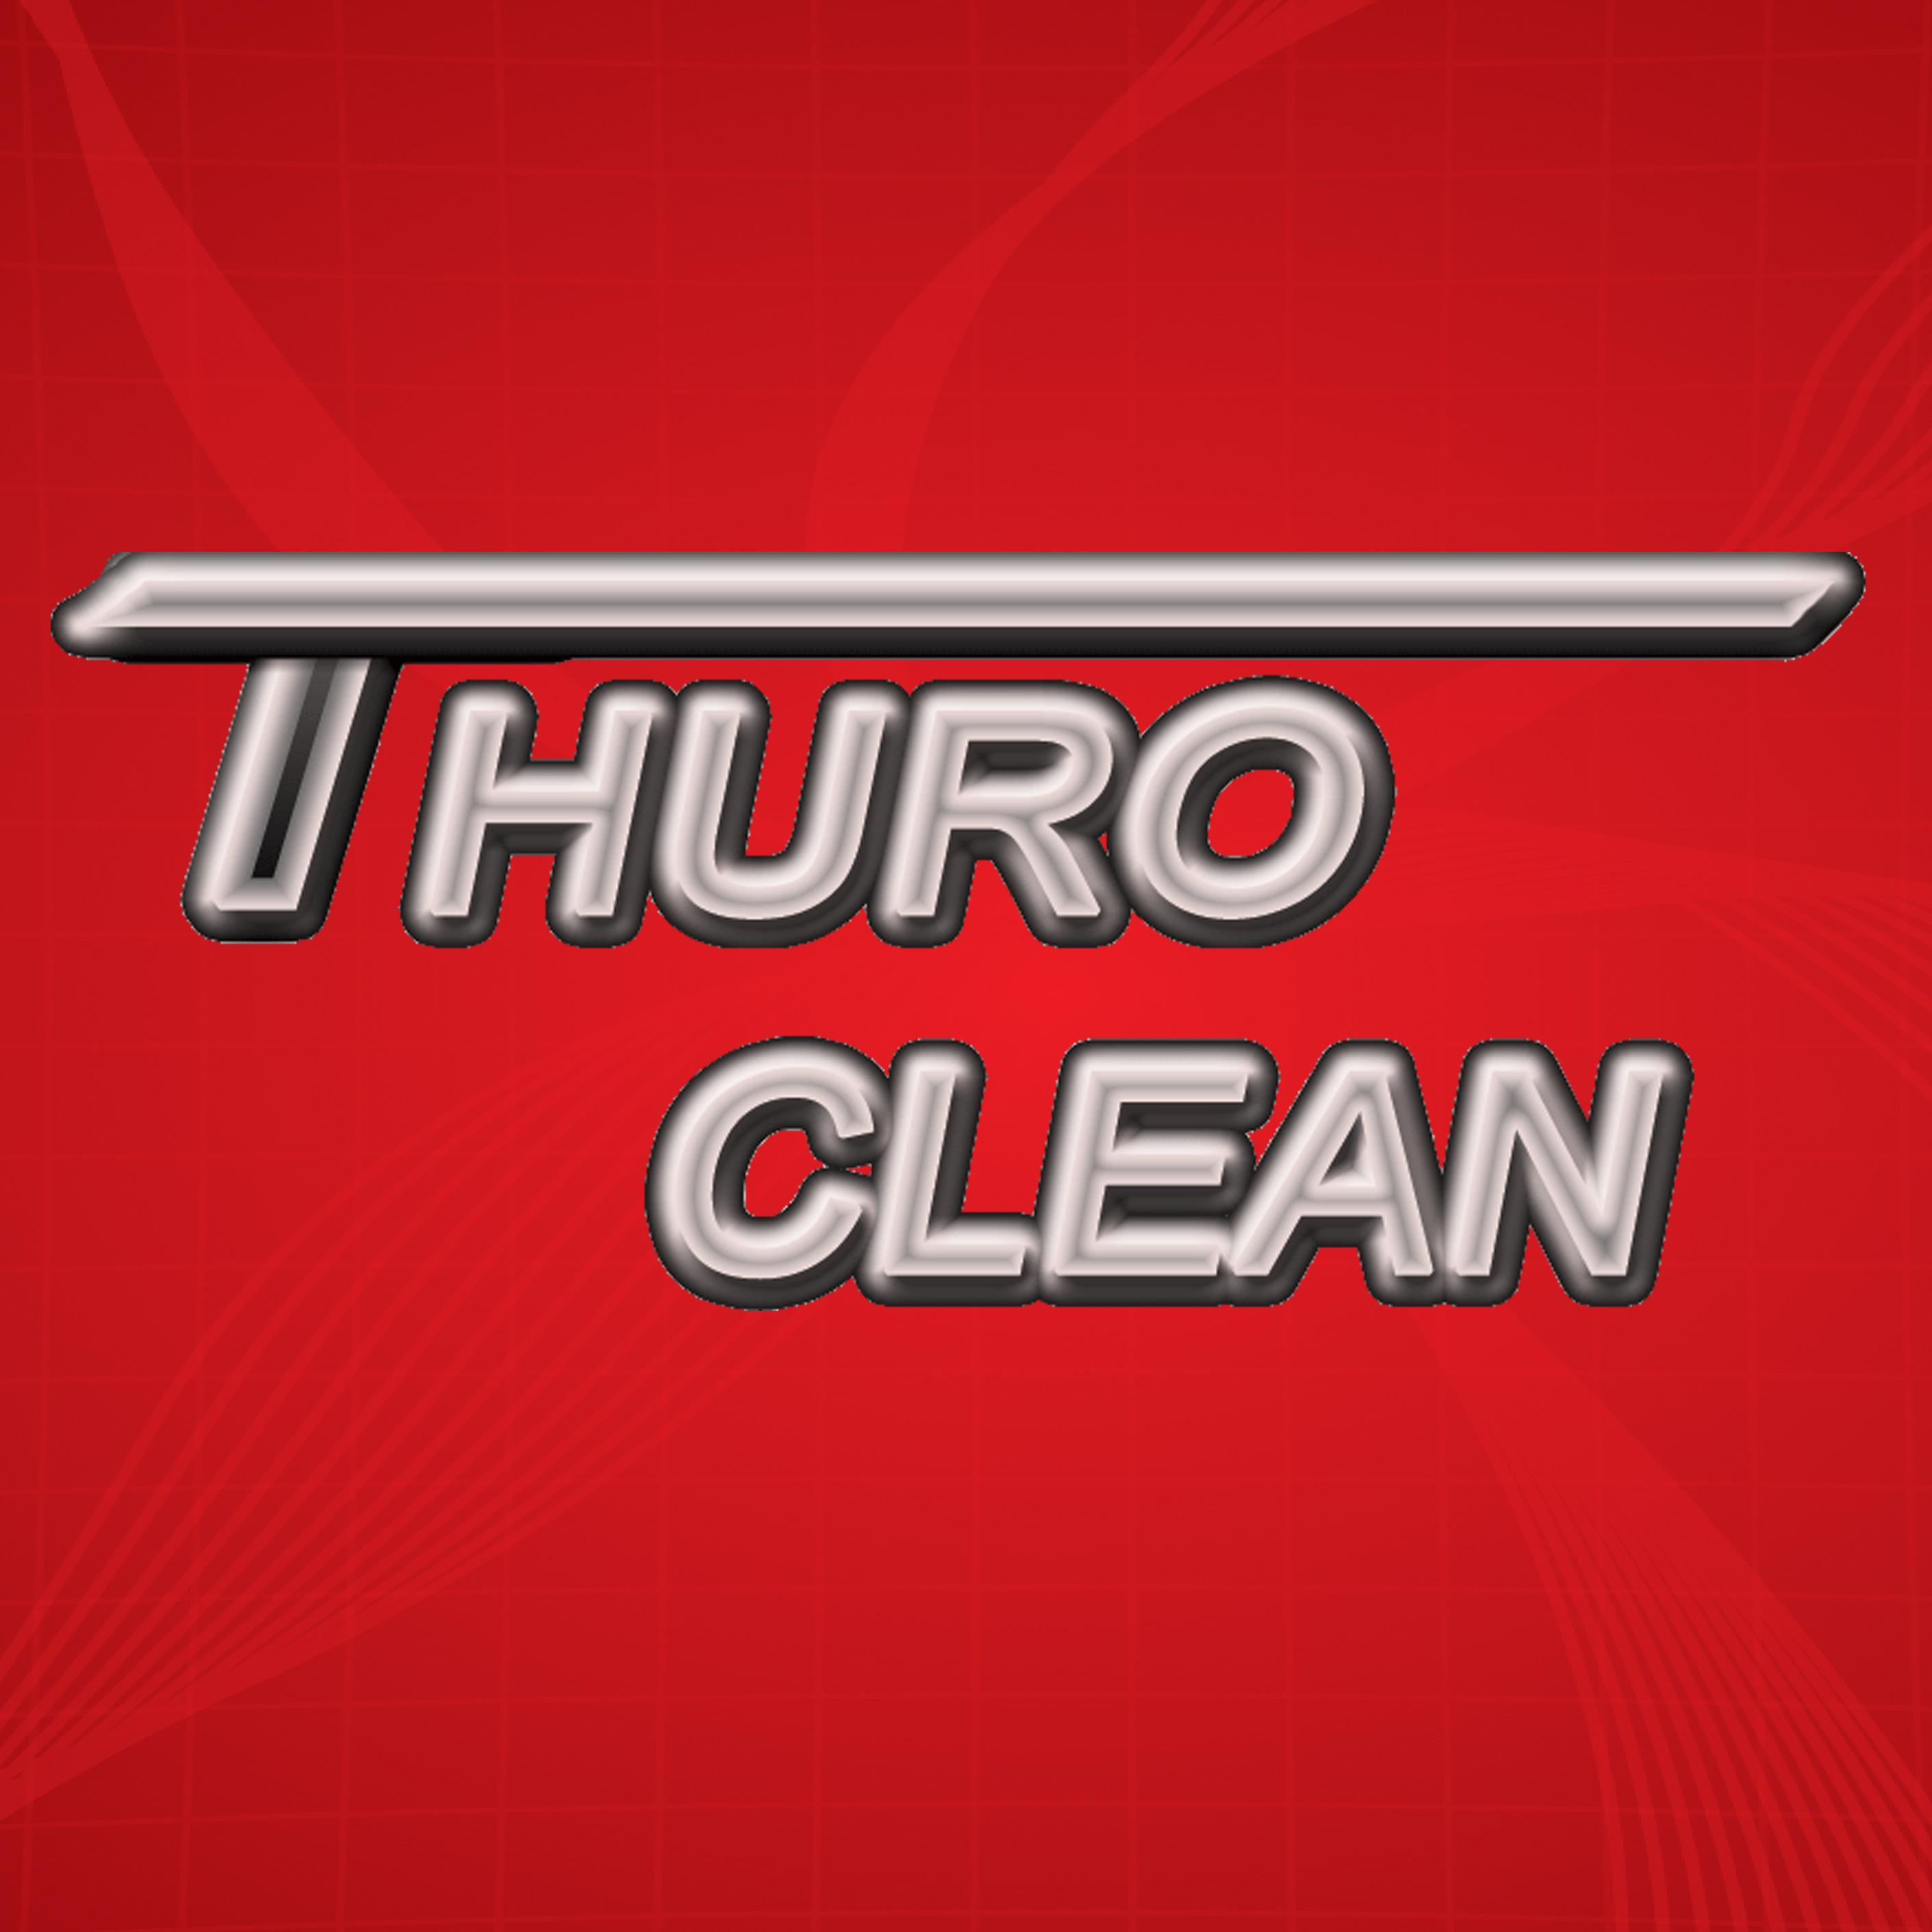 Thuro Clean Carpet & Upholstery LLC - Myrtle Beach, SC - Carpet & Upholstery Cleaning